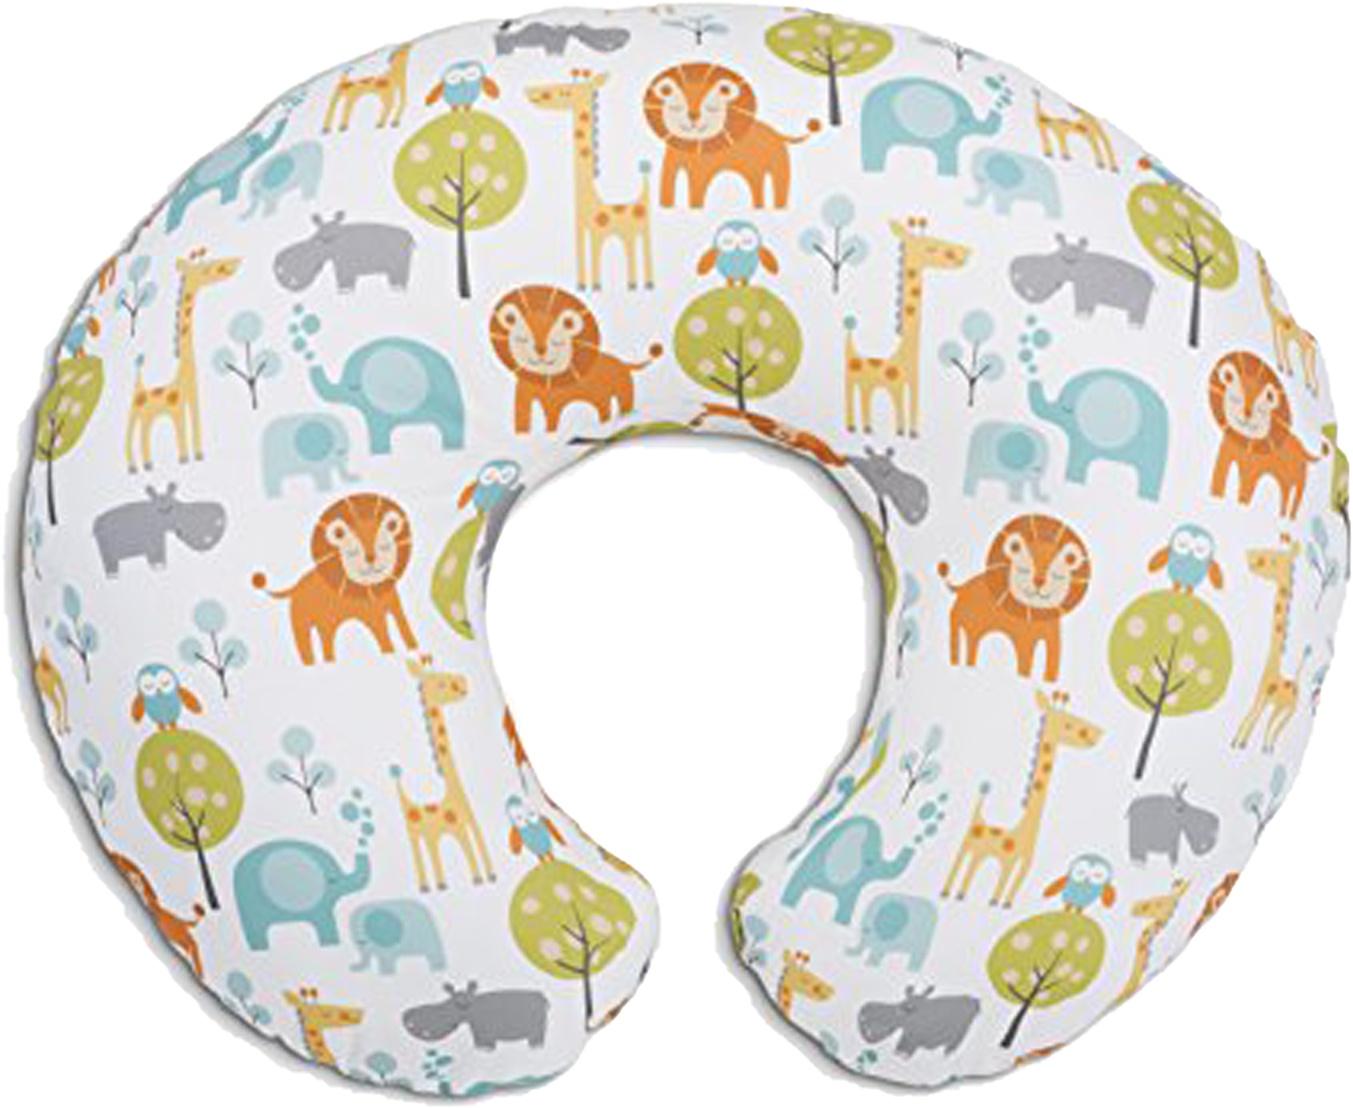 Подушка для кормящих и беременных Chicco Boppy Modern Woodland подушка для кормления chicco boppy colorful chevron